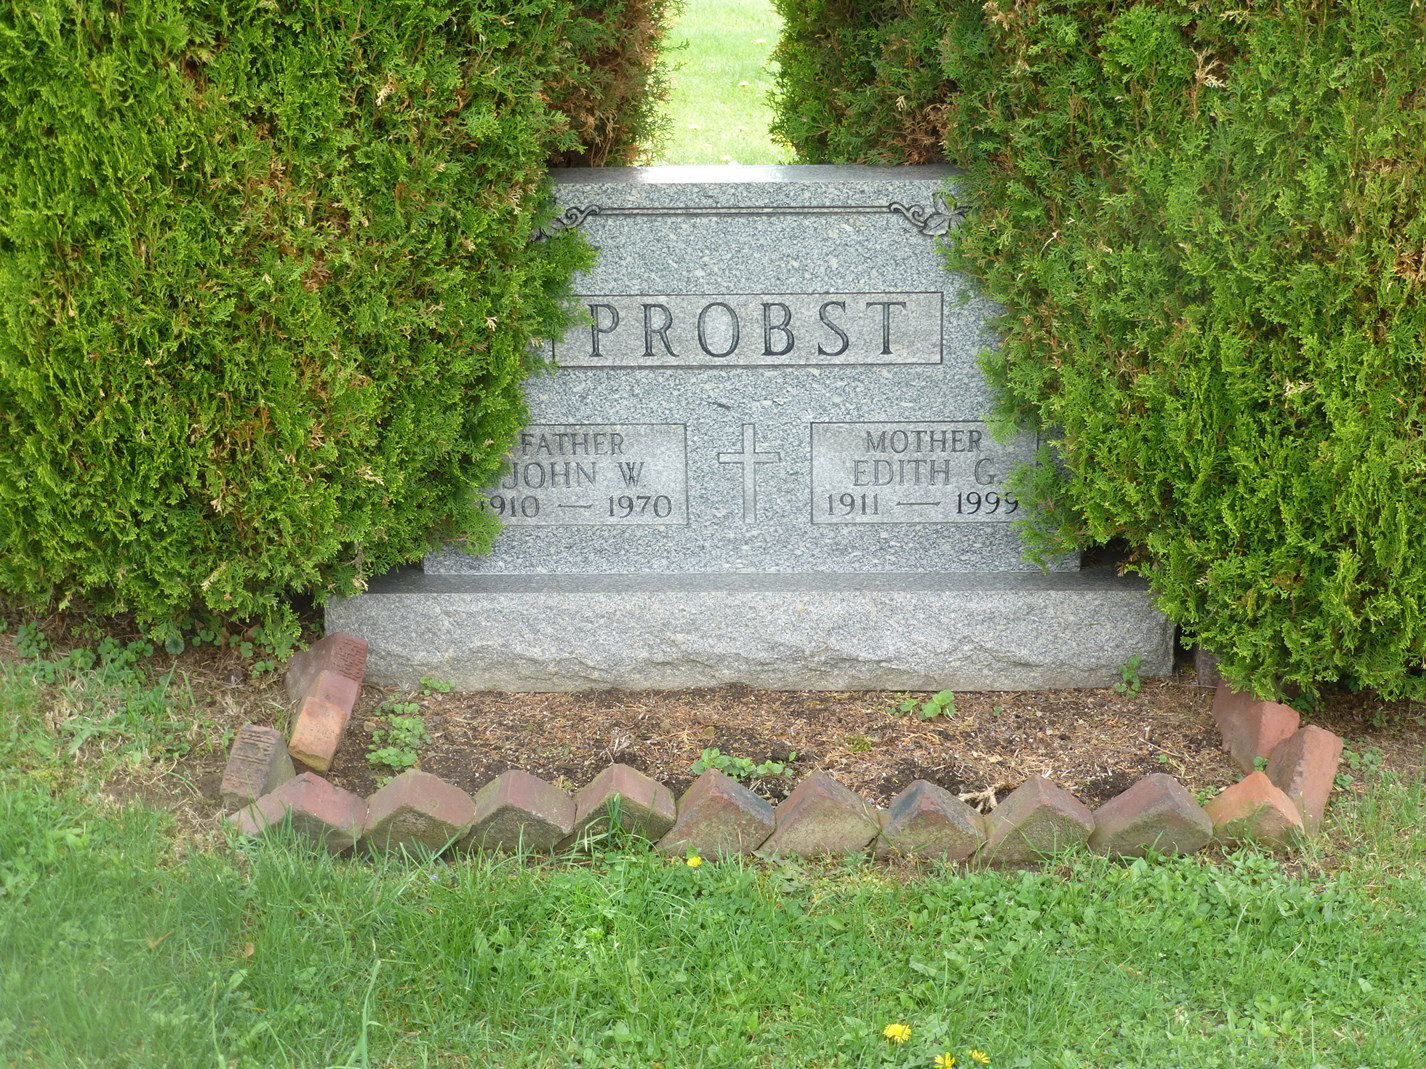 John Wesley Probst